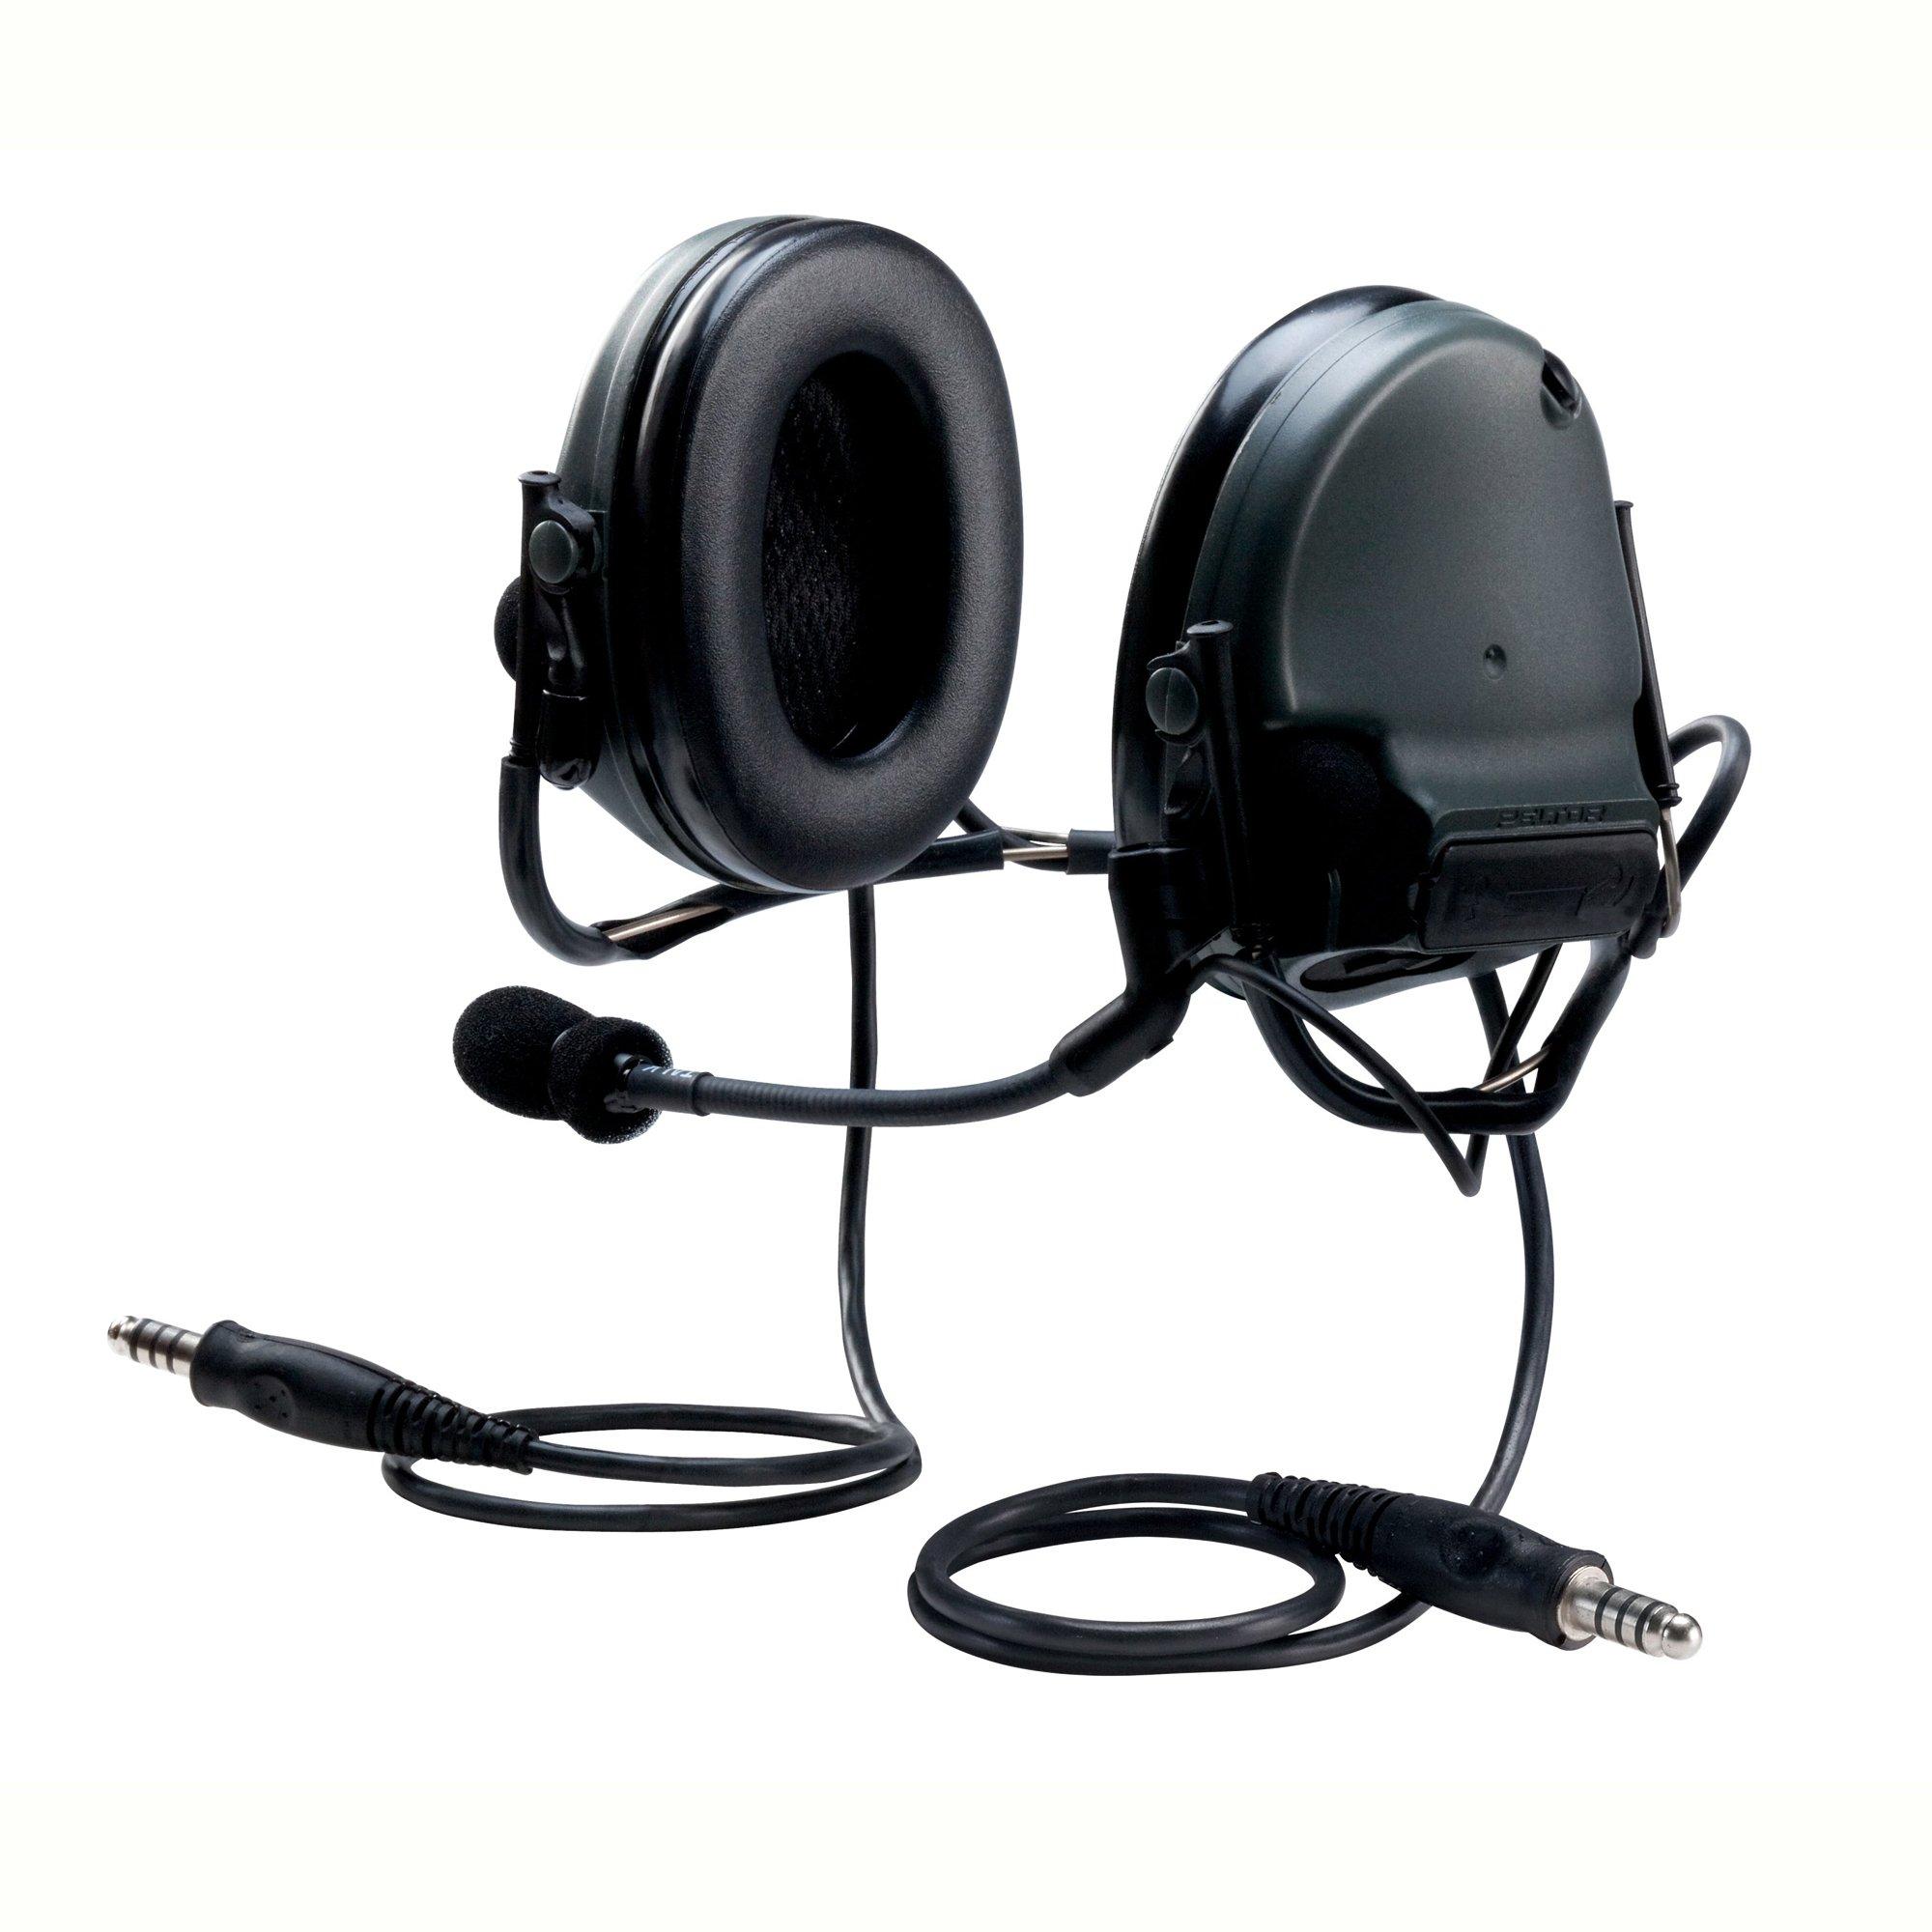 3M PELTOR SWAT-TAC 93353 PELTORSWAT-TACIII MT17H682BB-19 SV ACH Communication Headset, Dual COMM, Neckband, 6.25'' Height, 8.38'' Length, 6.06'' Width, Black